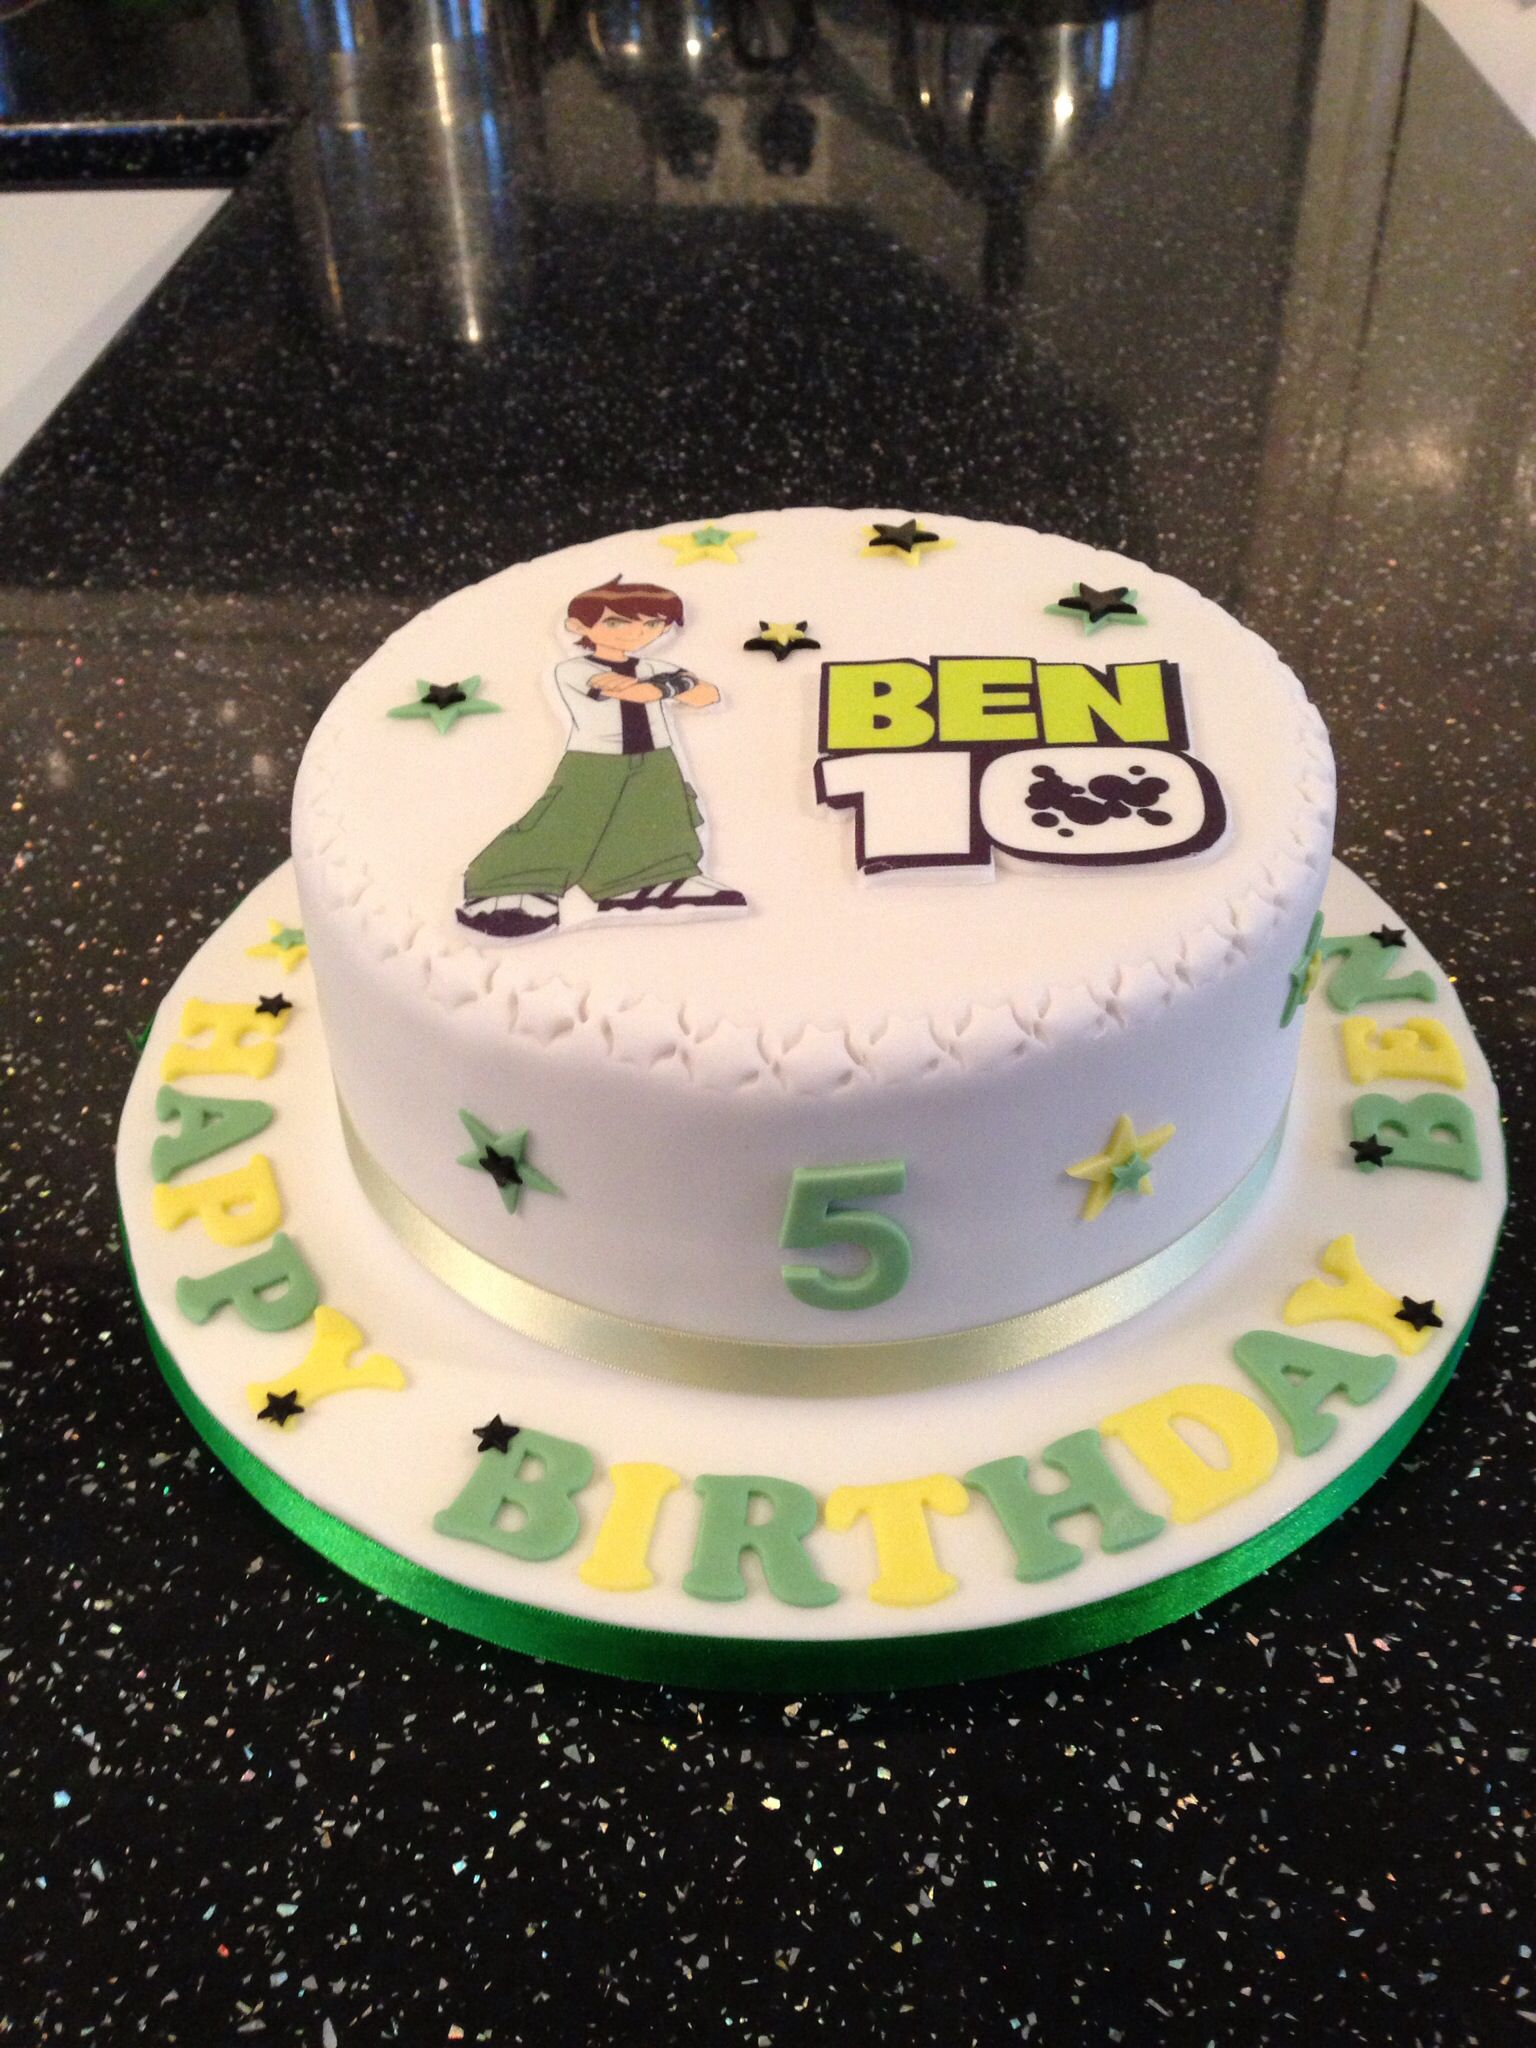 Ben 10 Birthday Cake Cakes Pinterest Birthday Cake 10